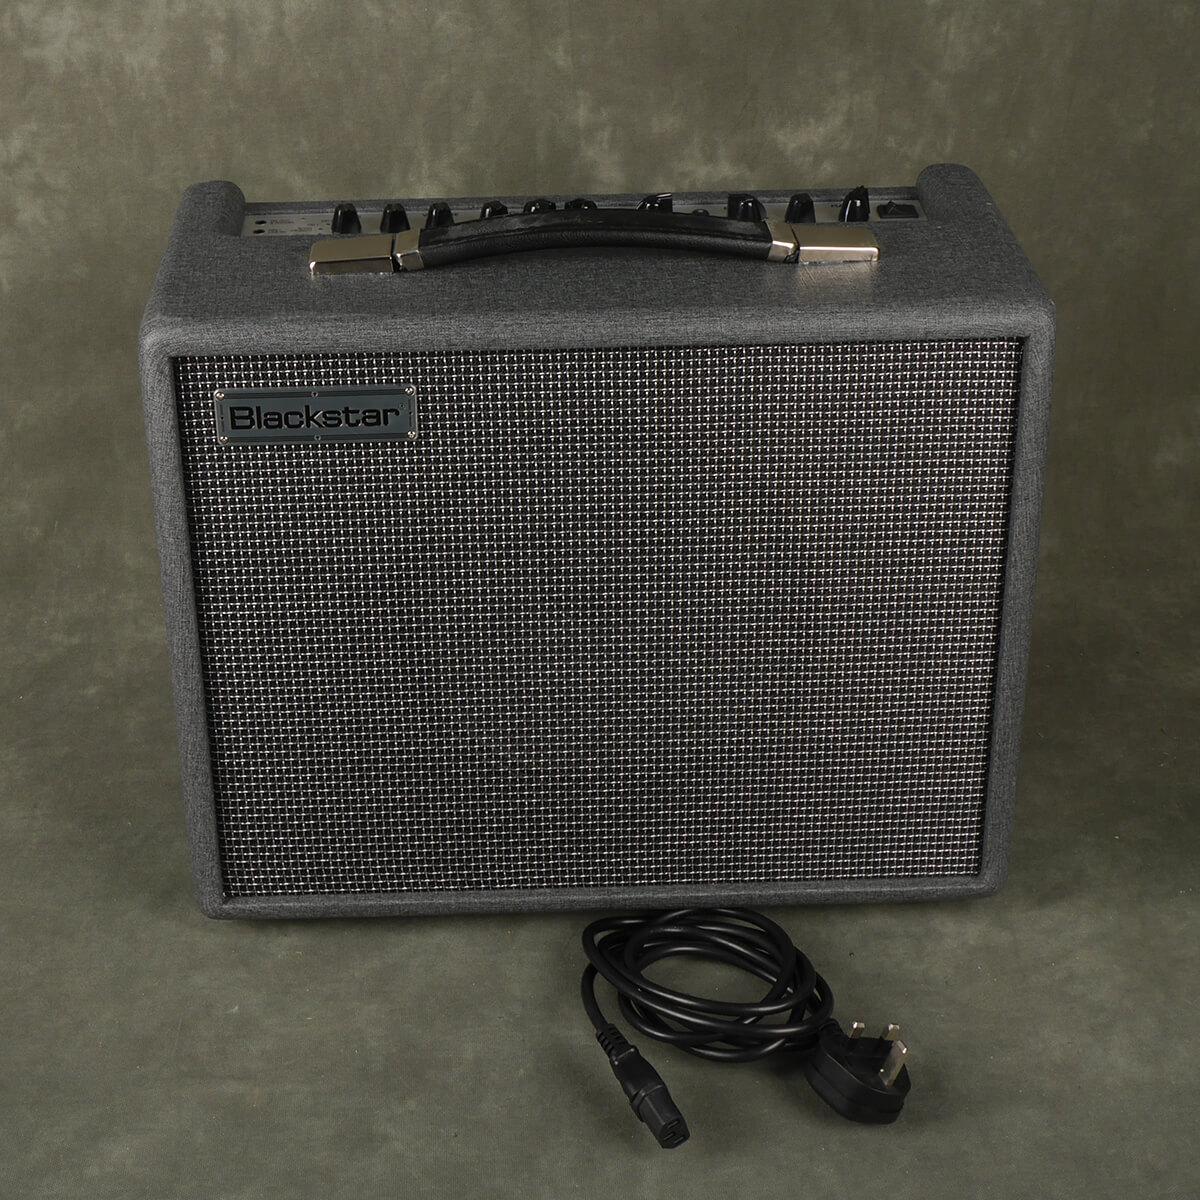 Blackstar Silverline Standard 20 Amplifier - 2nd Hand